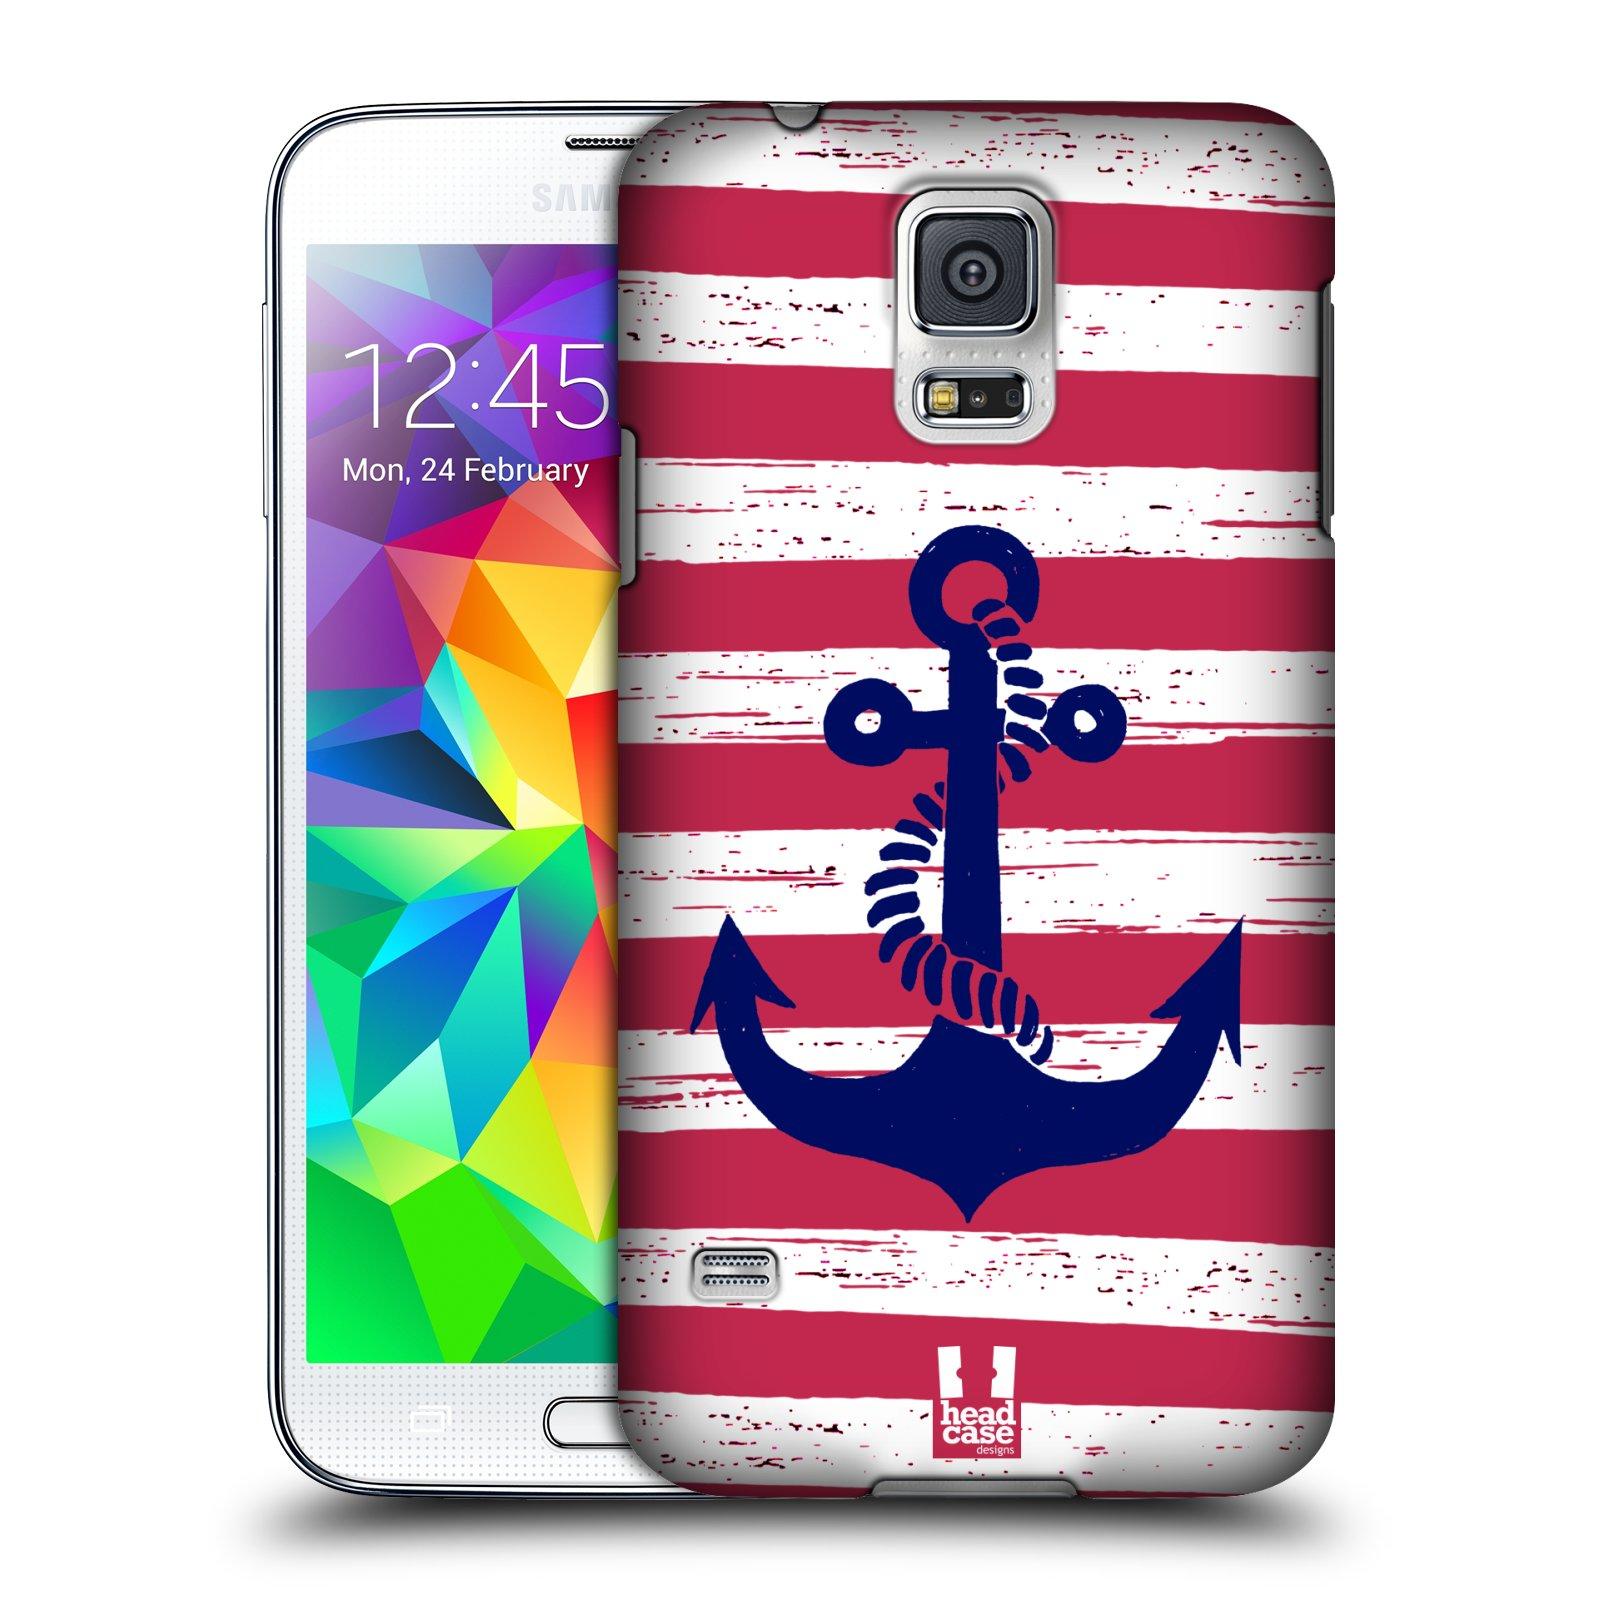 Plastové pouzdro na mobil Samsung Galaxy S5 HEAD CASE KOTVA S PRUHY